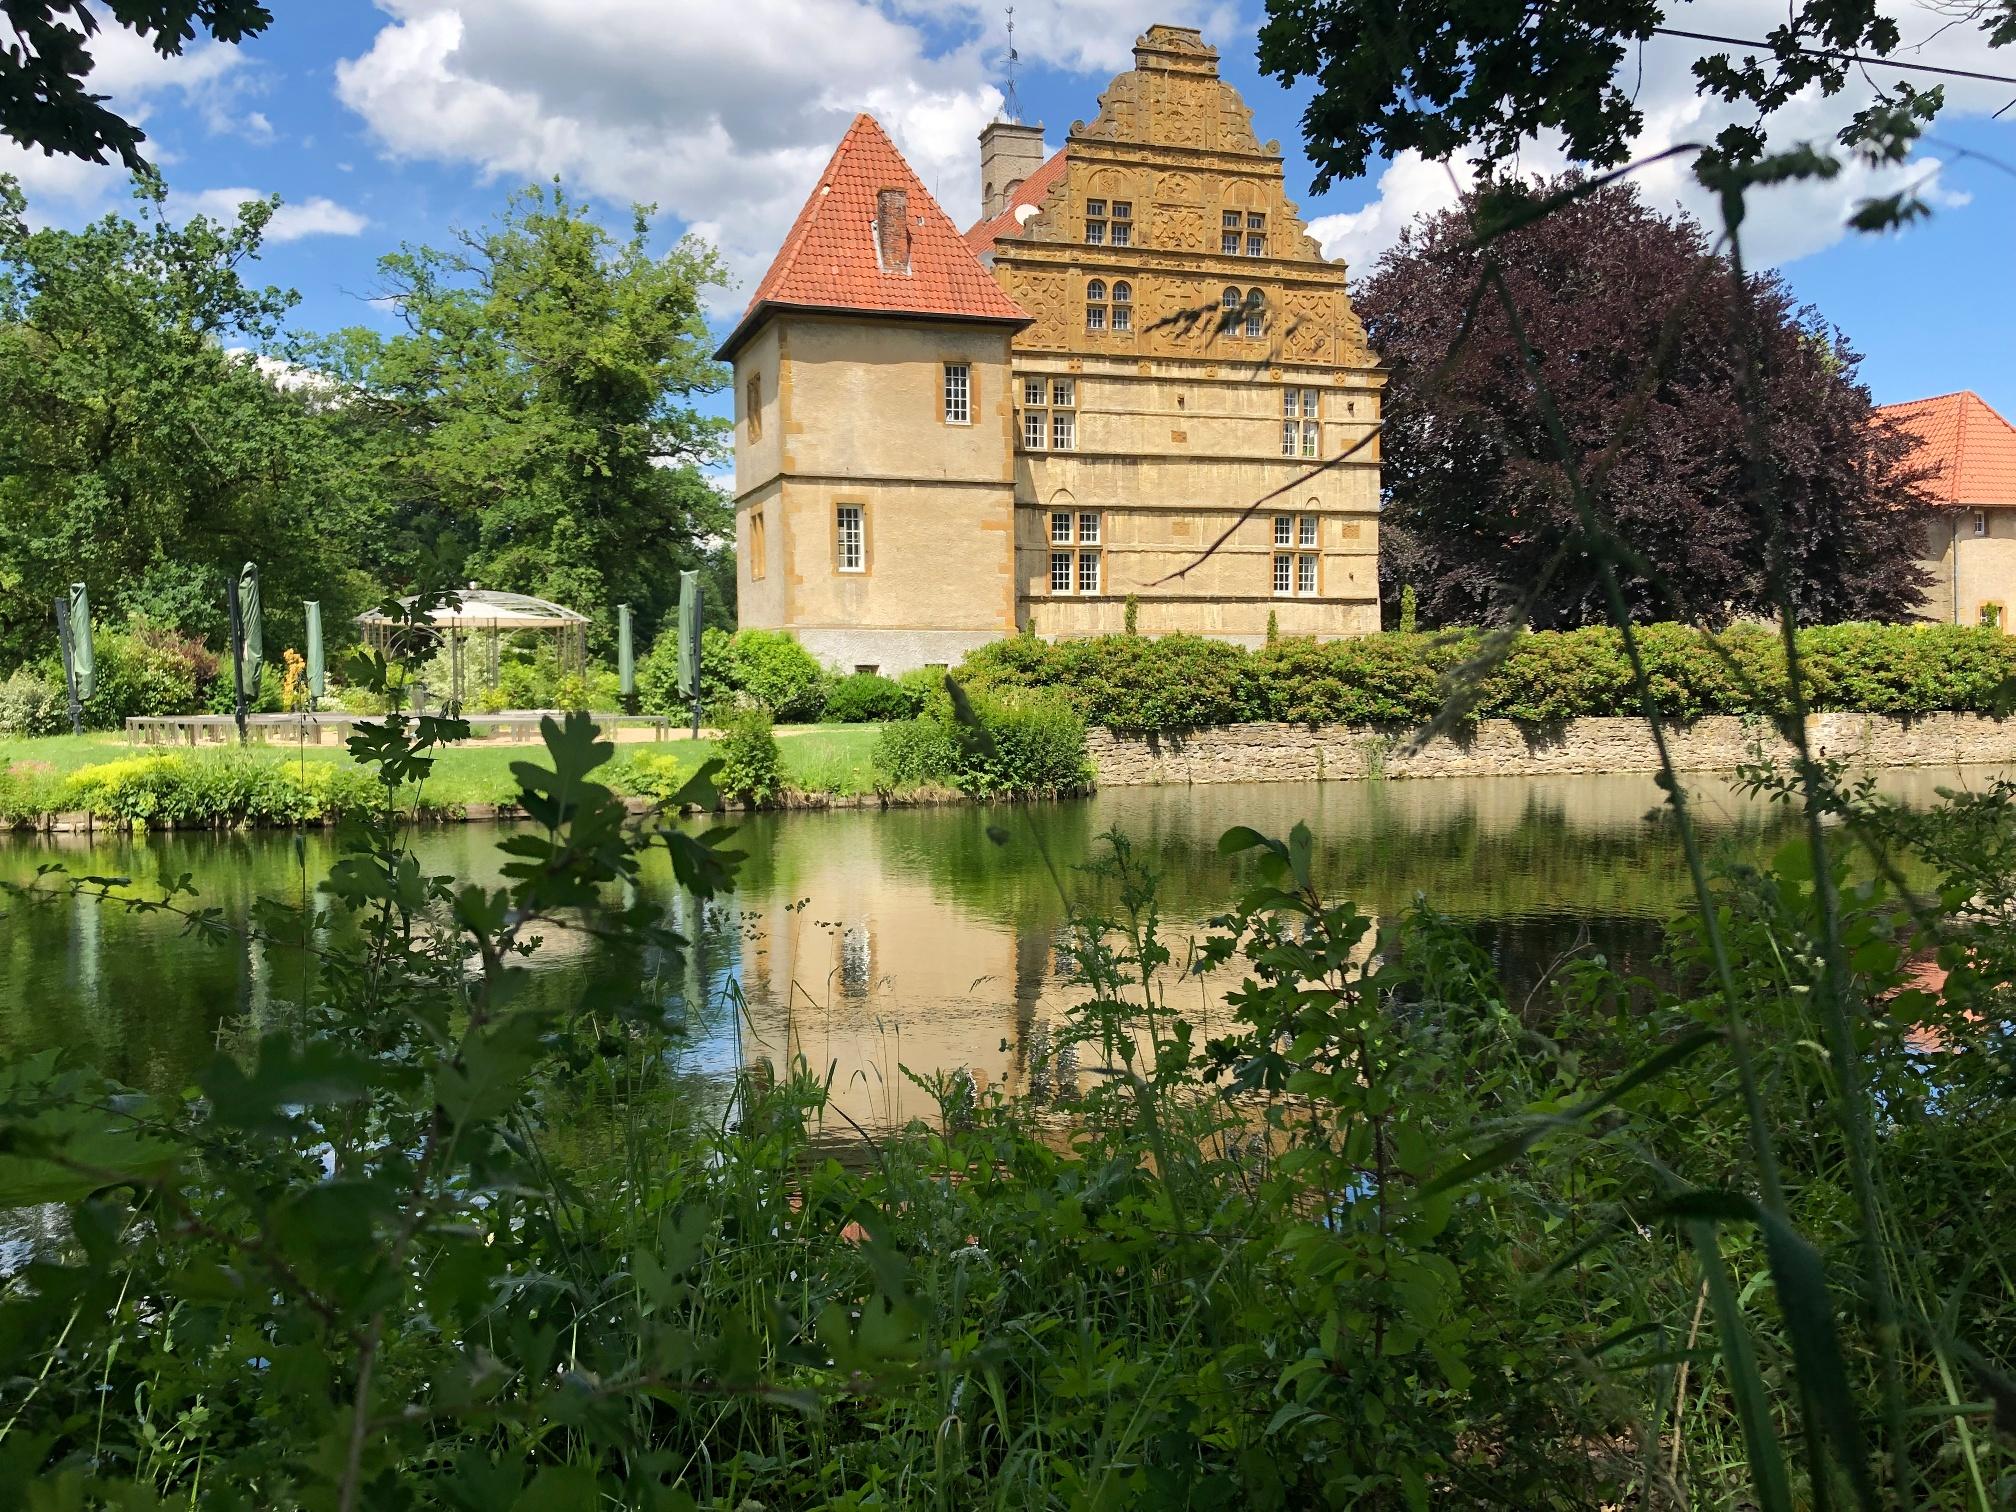 Schloss Holtfeld